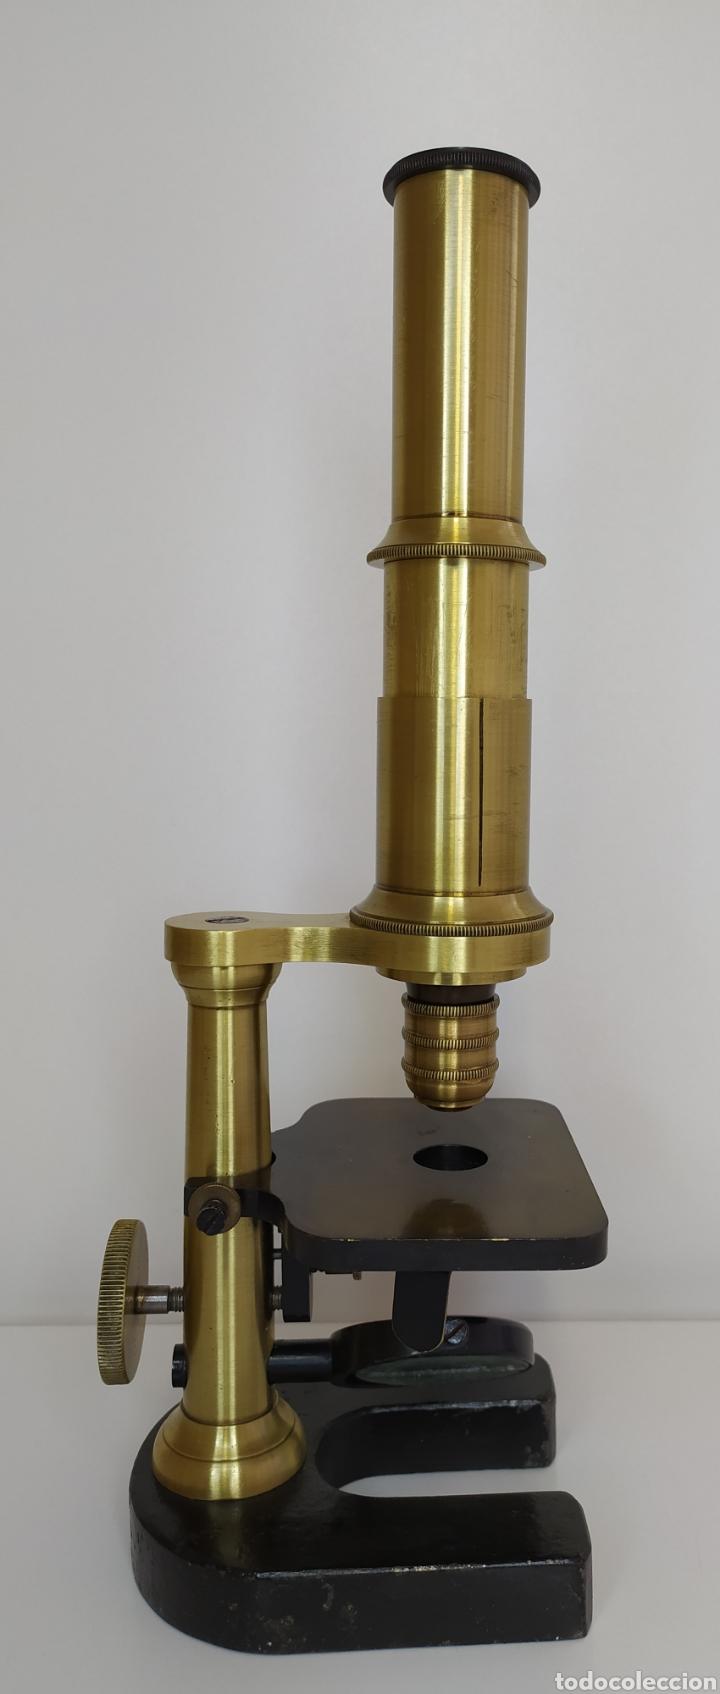 Antigüedades: Antiguo microscopio circa 1880. Tipo Schiek - Foto 8 - 253829690